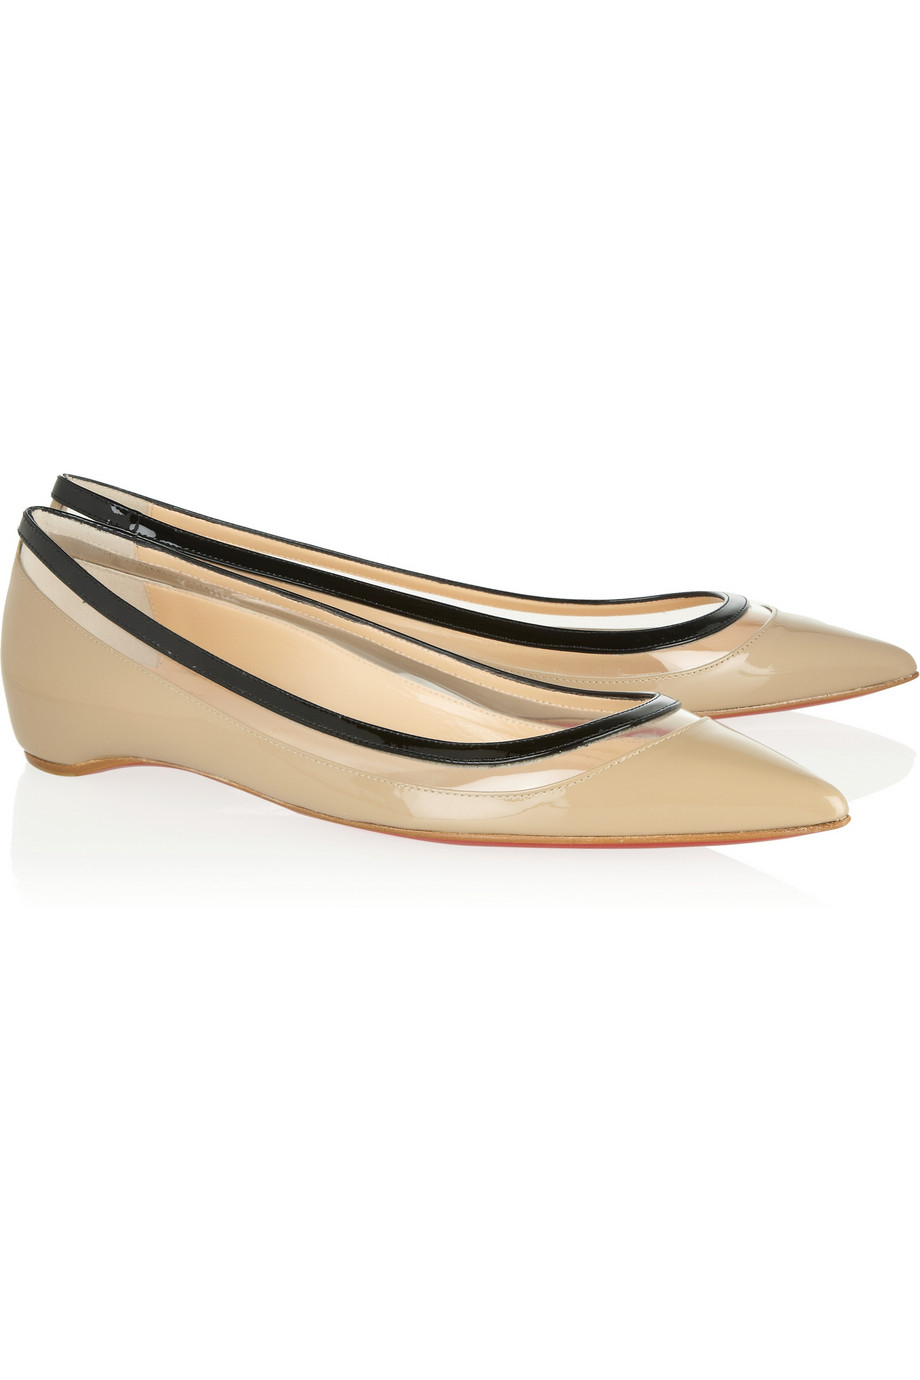 louboutin loafers - christian louboutin flats Beige metallic threading | The Little ...